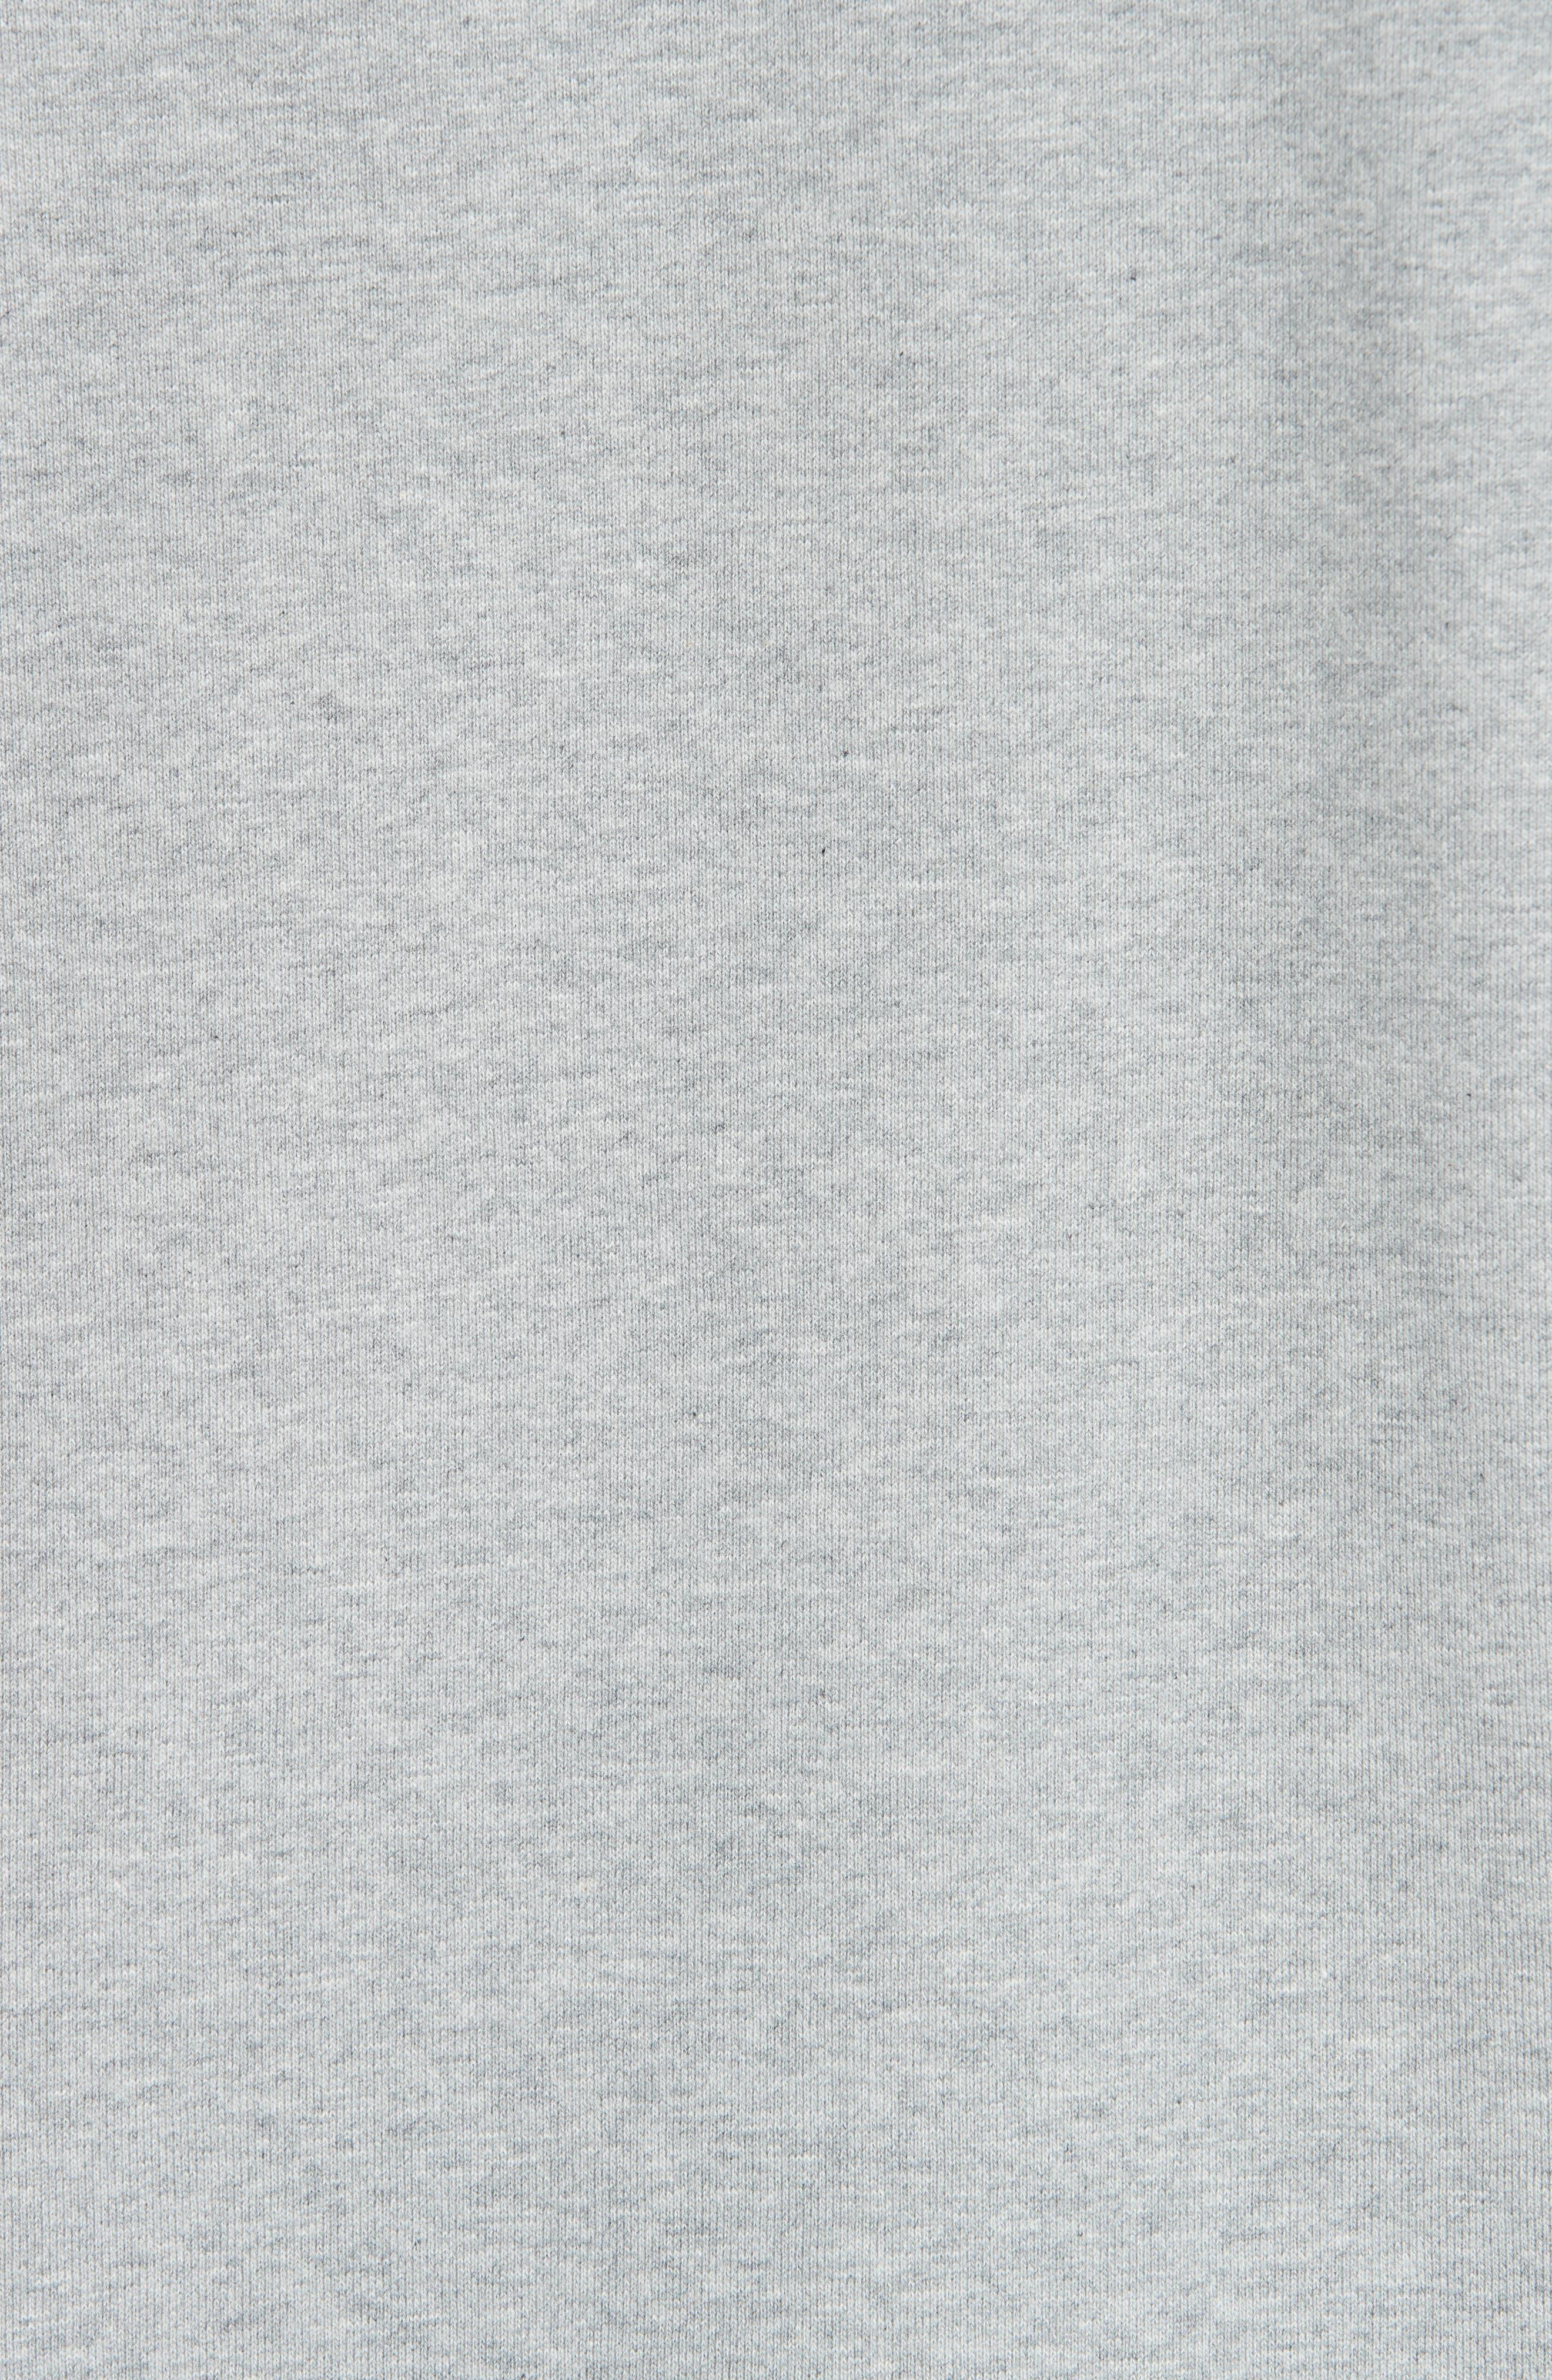 LOEWE, Embroidered Anagram Logo Sweatshirt, Alternate thumbnail 5, color, 1120 GREY